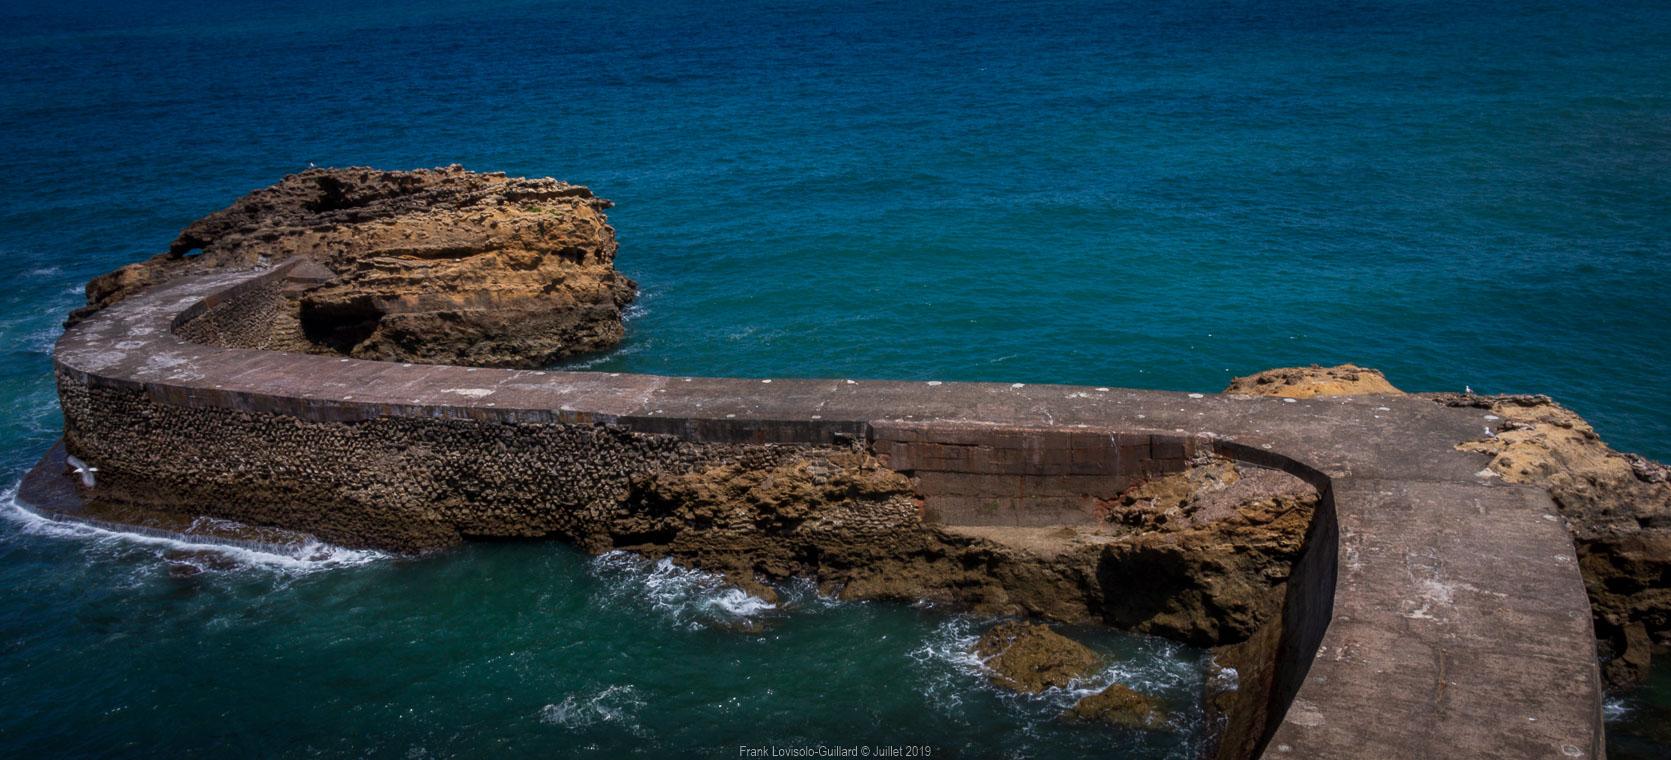 biarritz n 090